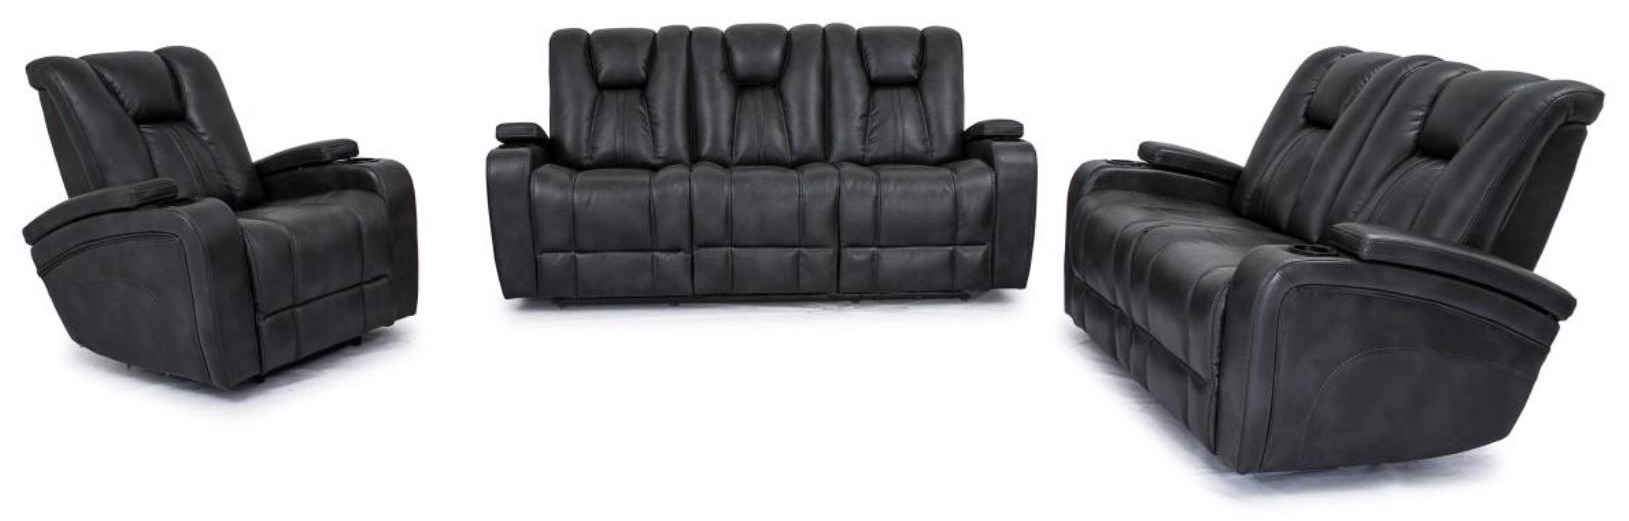 3 PC Reclining Living Room Set